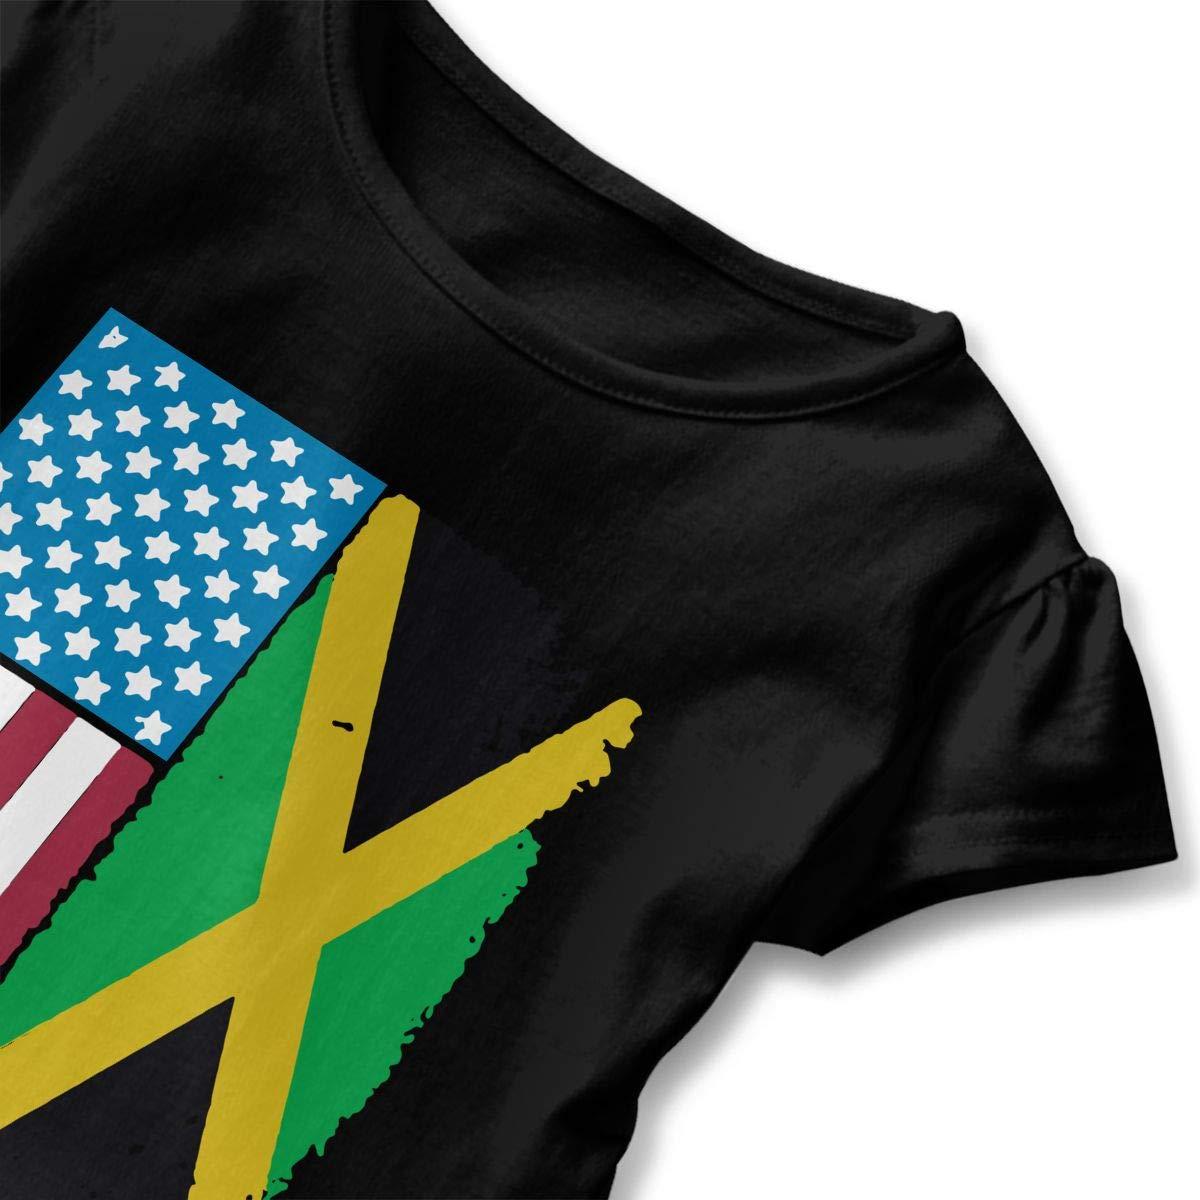 SHIRT1-KIDS Jamaican American Flag Jamaica USA Toddler//Infant Girls Short Sleeve Ruffles Shirt T-Shirt for 2-6 Toddlers